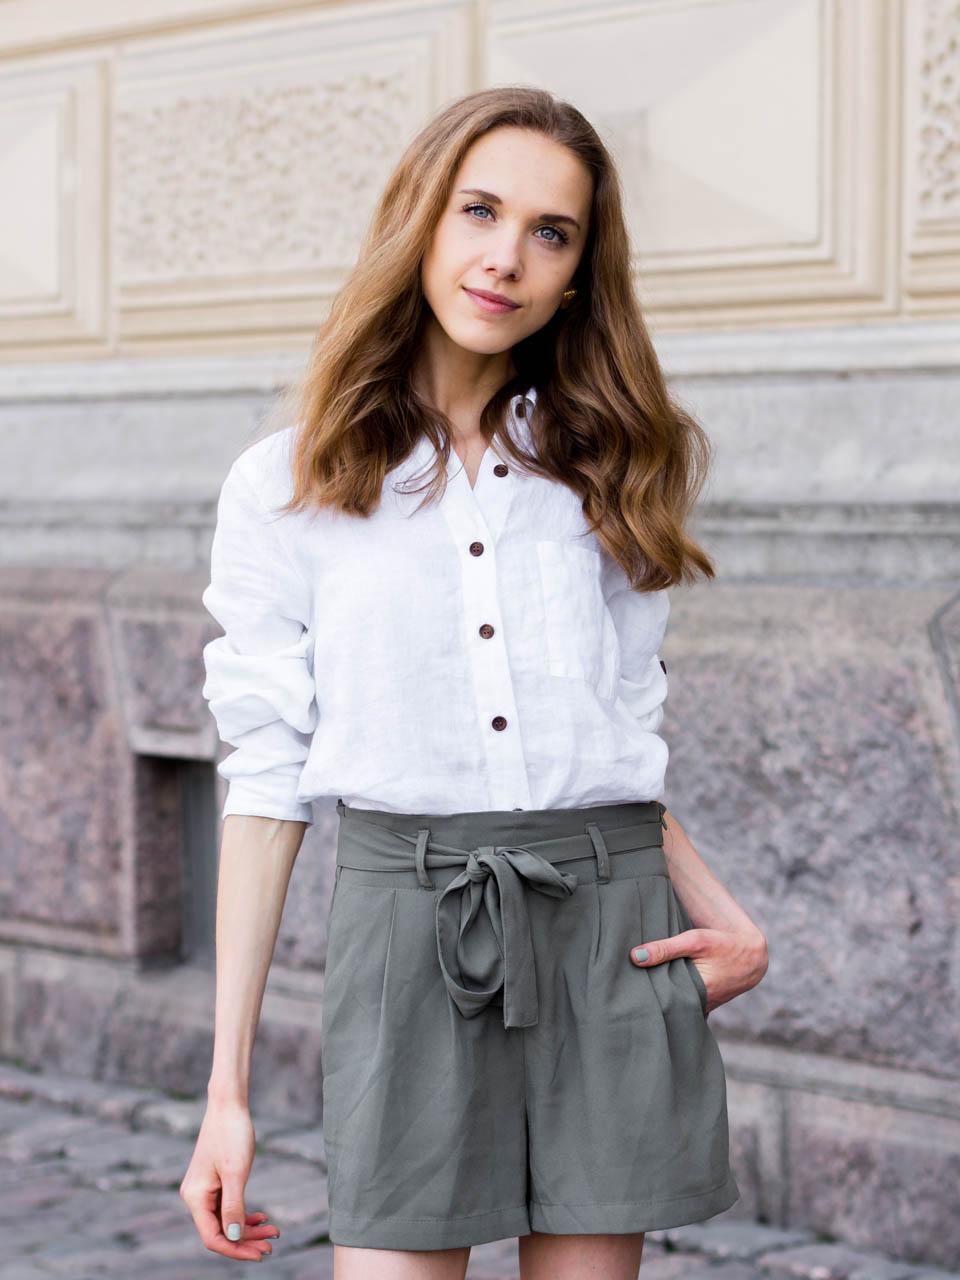 summer-outfit-inspiration-fashion-blogger-2019-safari-chic